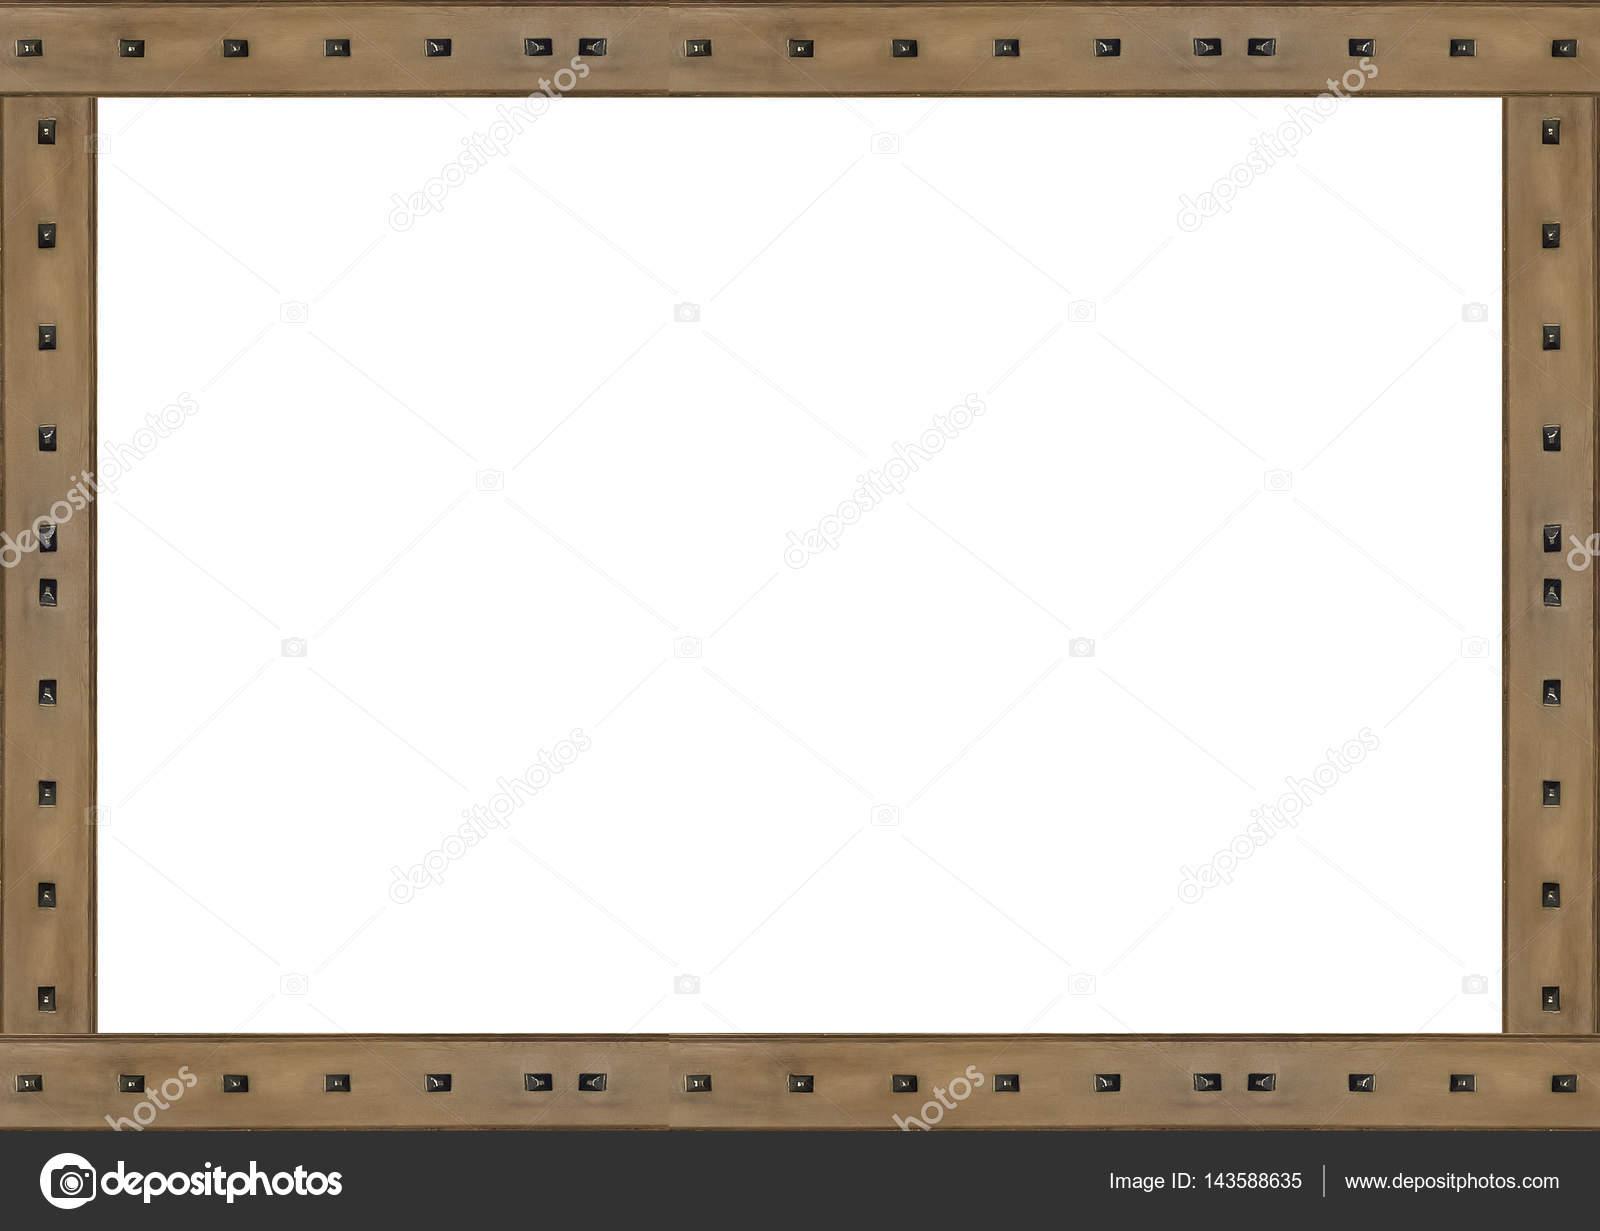 Fondo de marco blanco fronteras de madera decoradas — Fotos de Stock ...